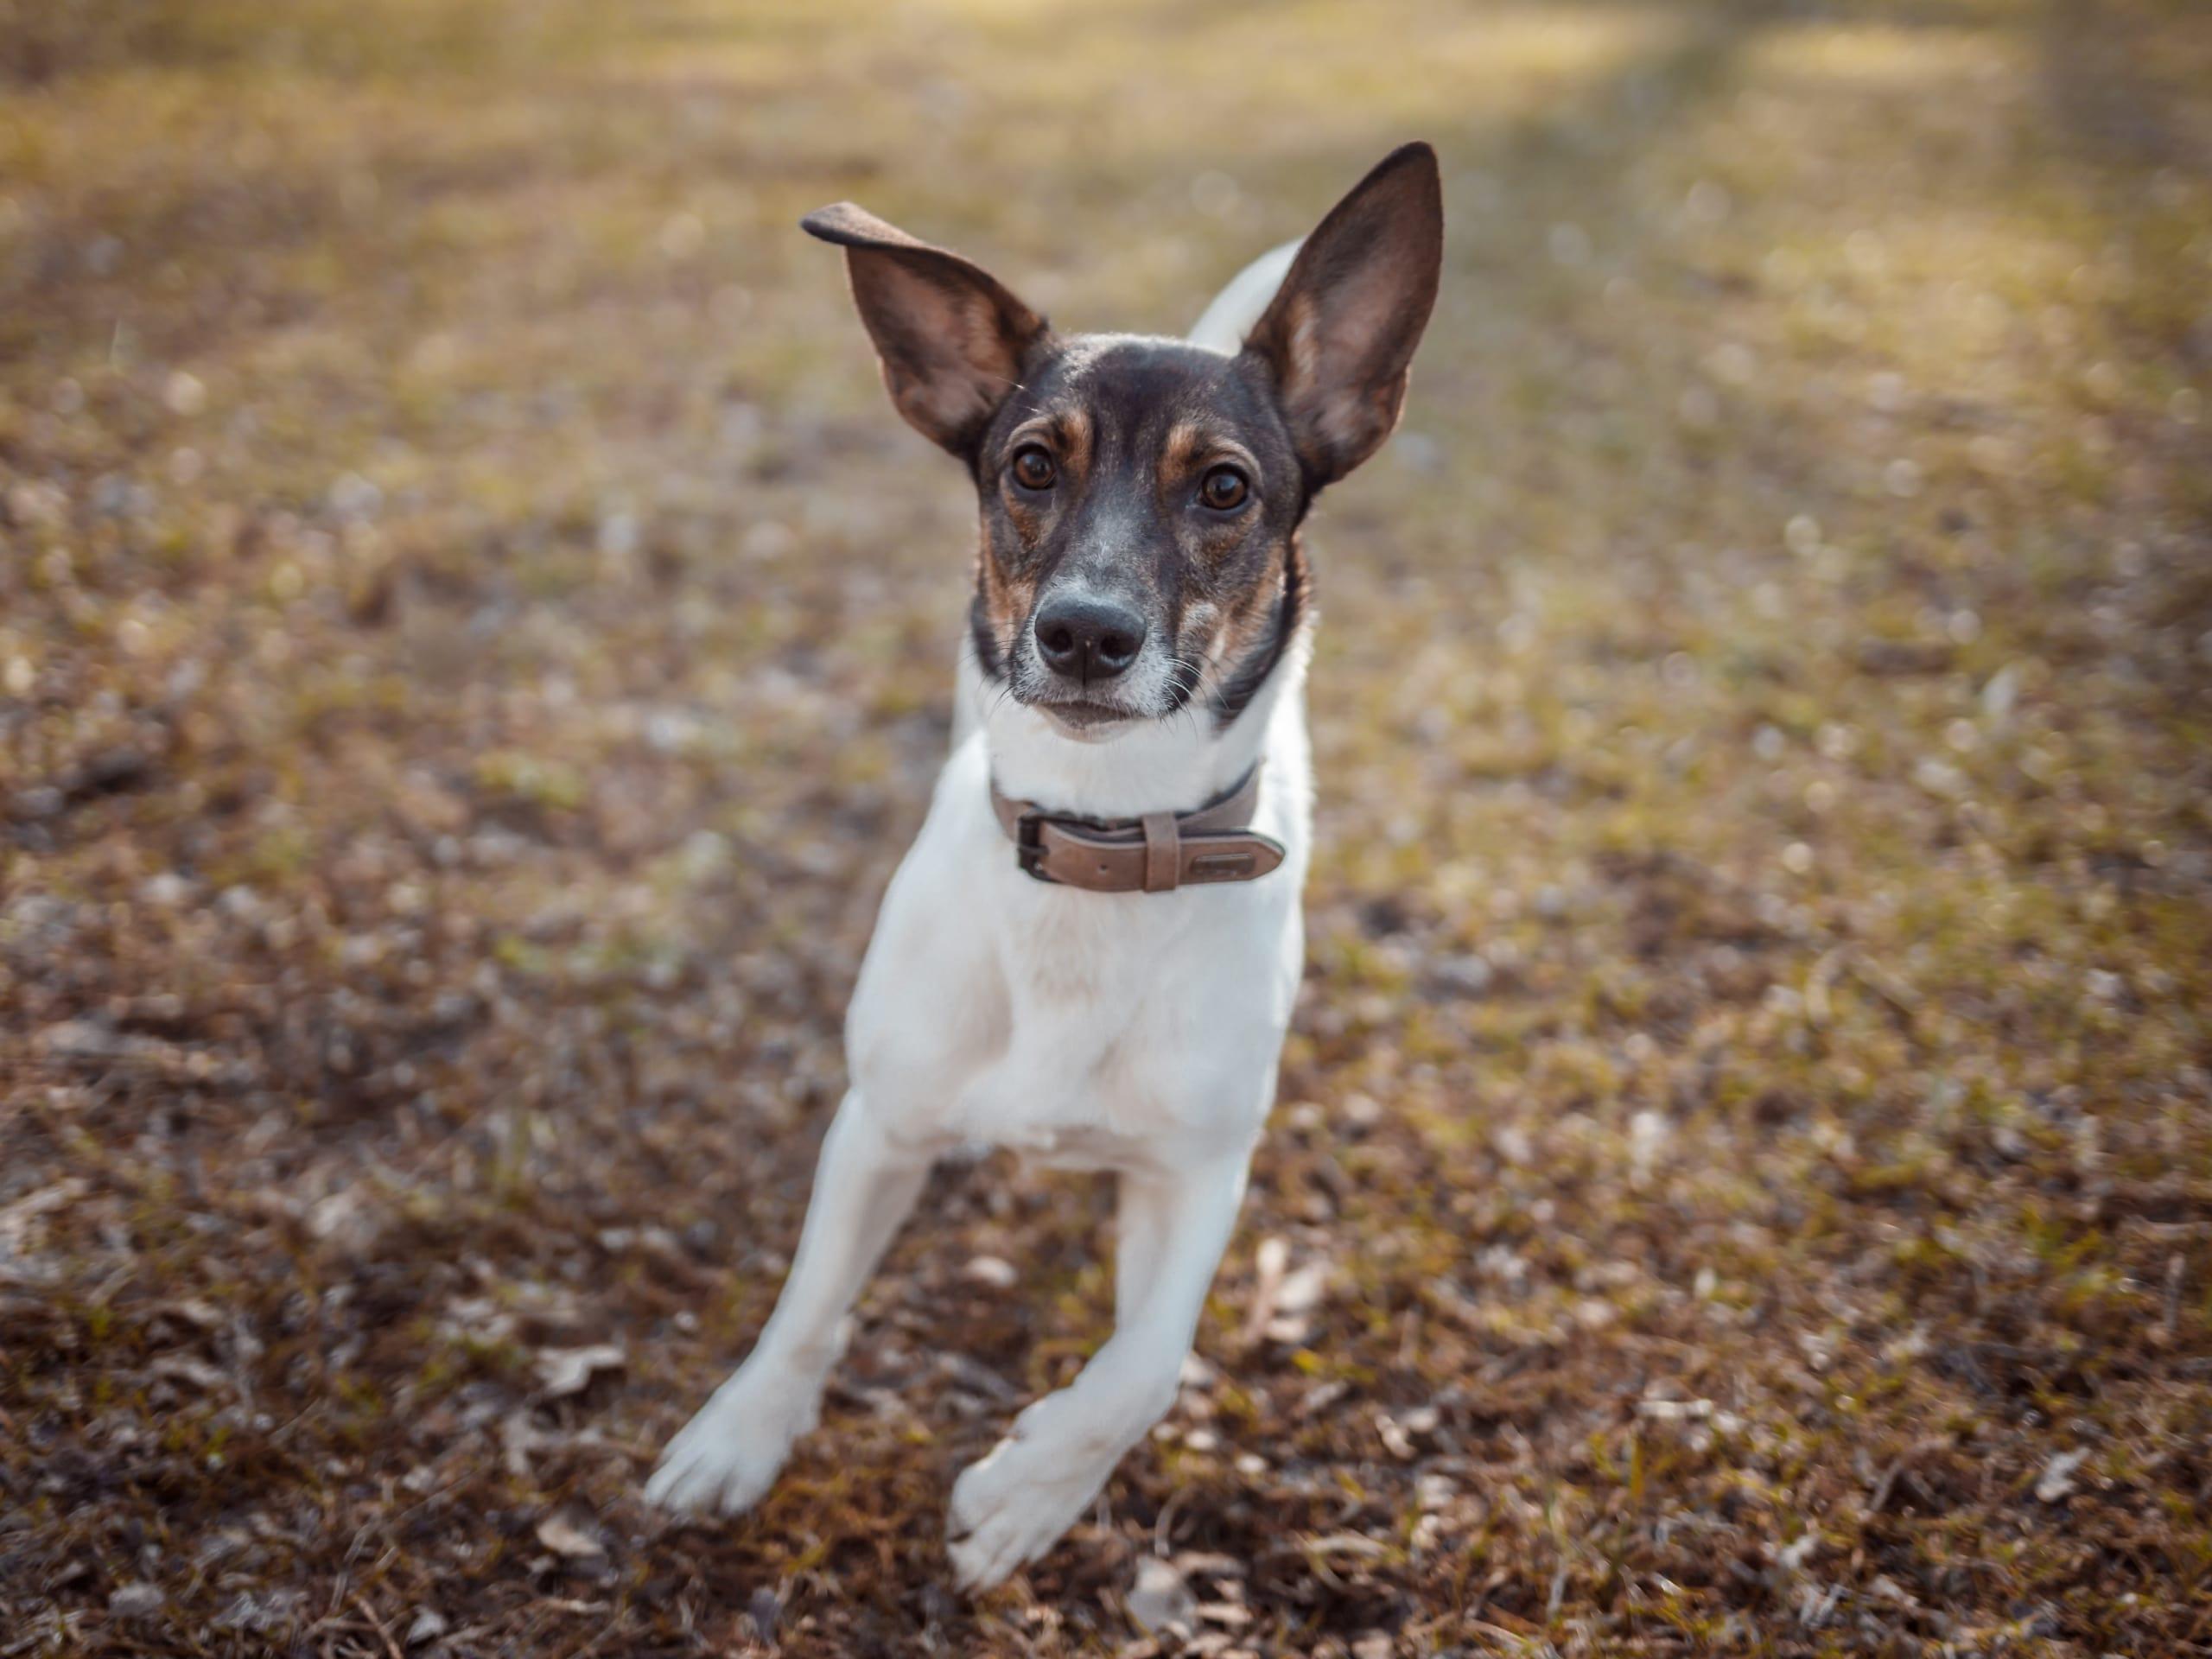 Lost Terrier dog found running in a field